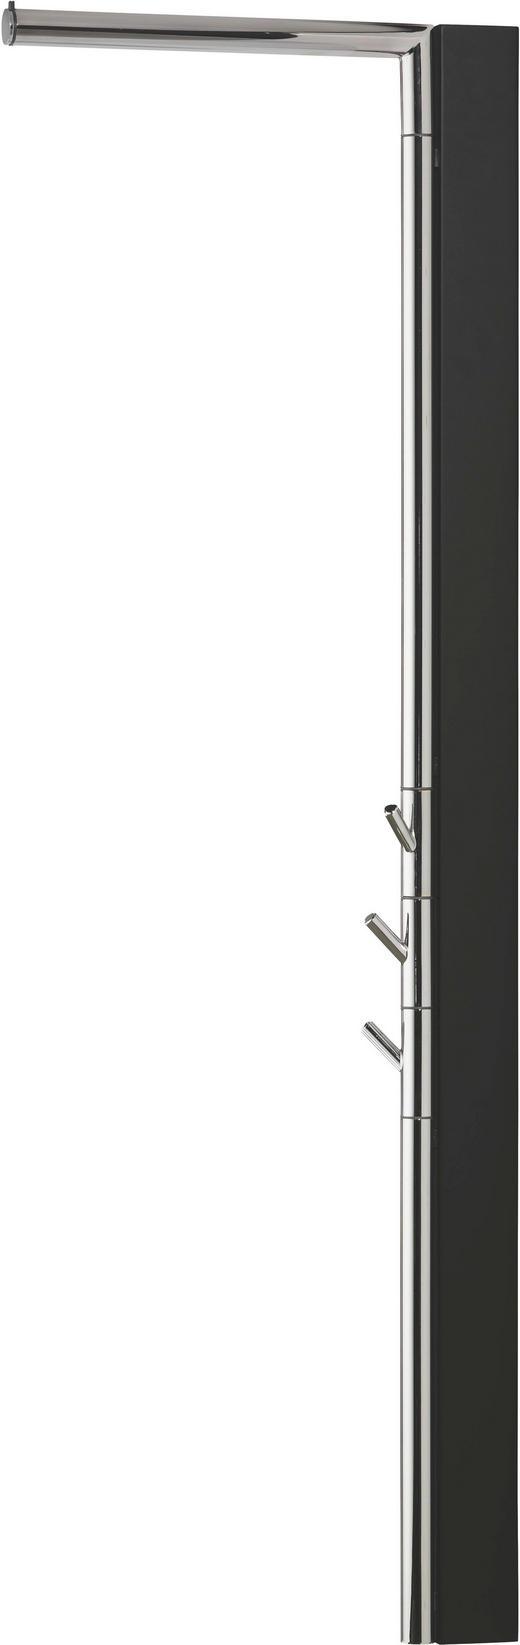 WANDGARDEROBE Buche massiv Schwarz - Schwarz, Design, Holz (2,5(35)/120/38,5cm)